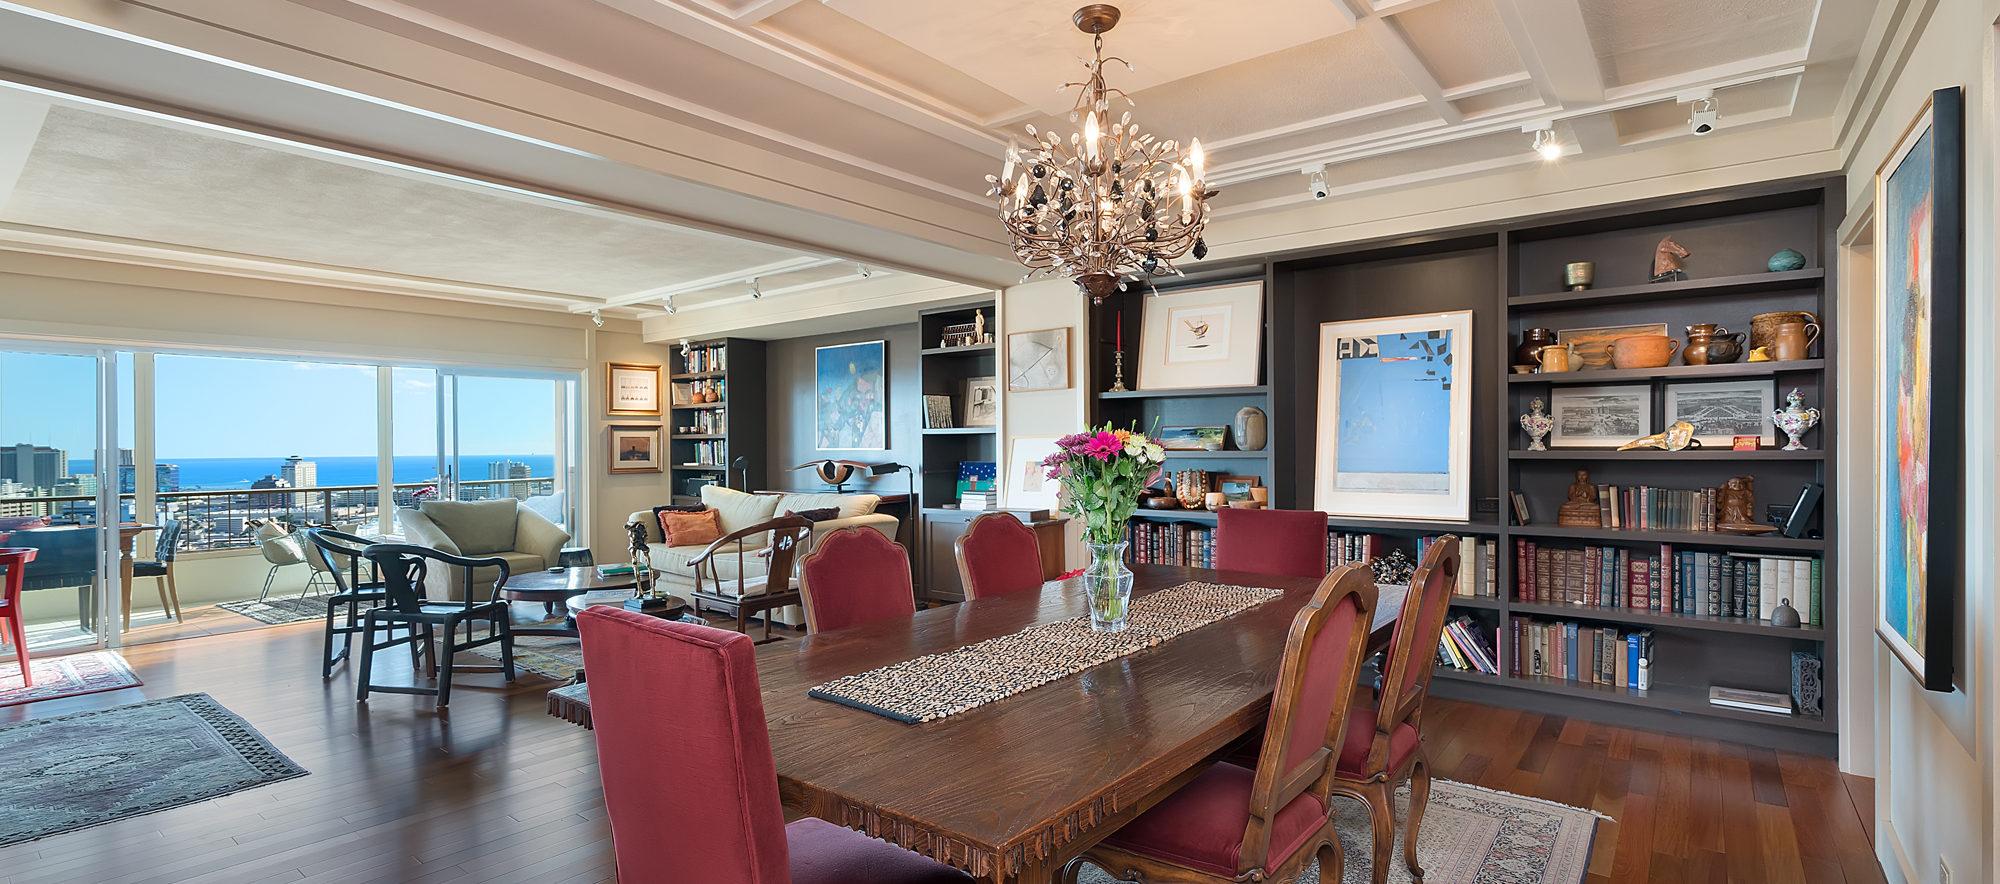 Homepage Slider – 999 Wilder Living Room